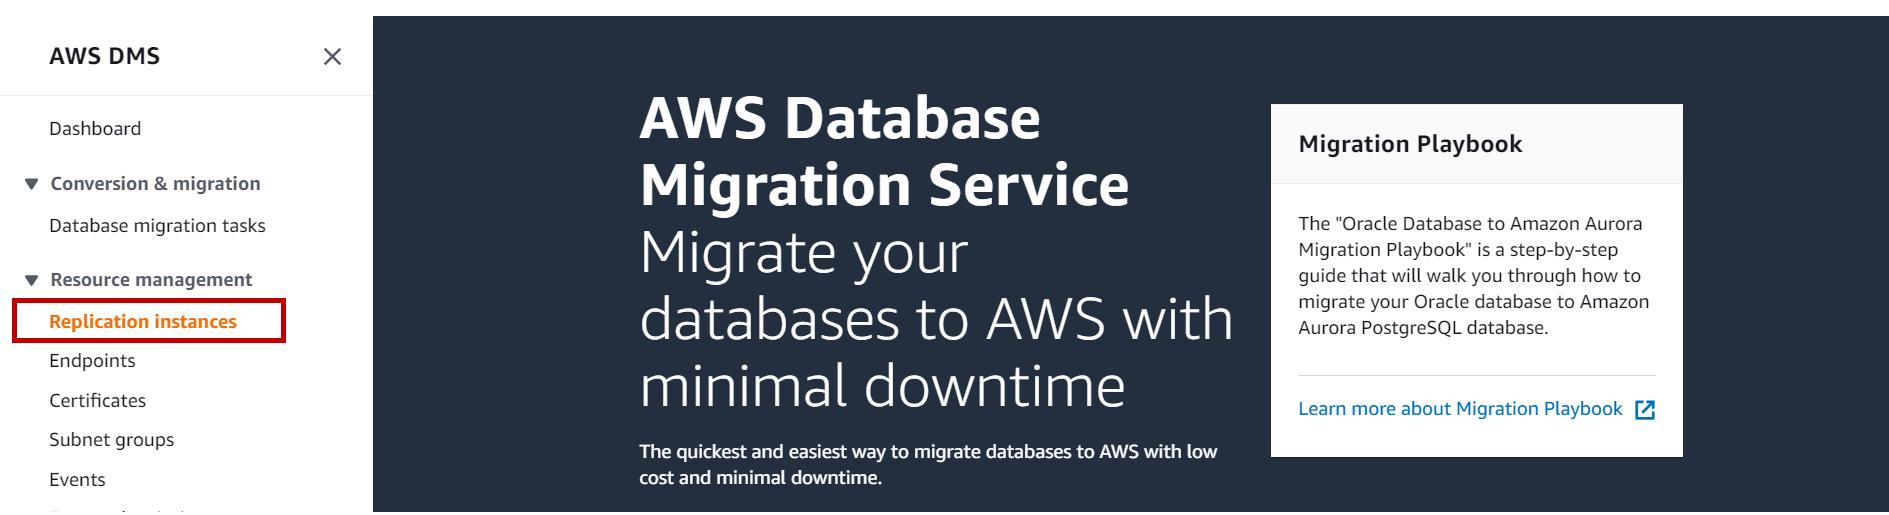 AWS RDS SQL Server Migration using AWS Database migration service